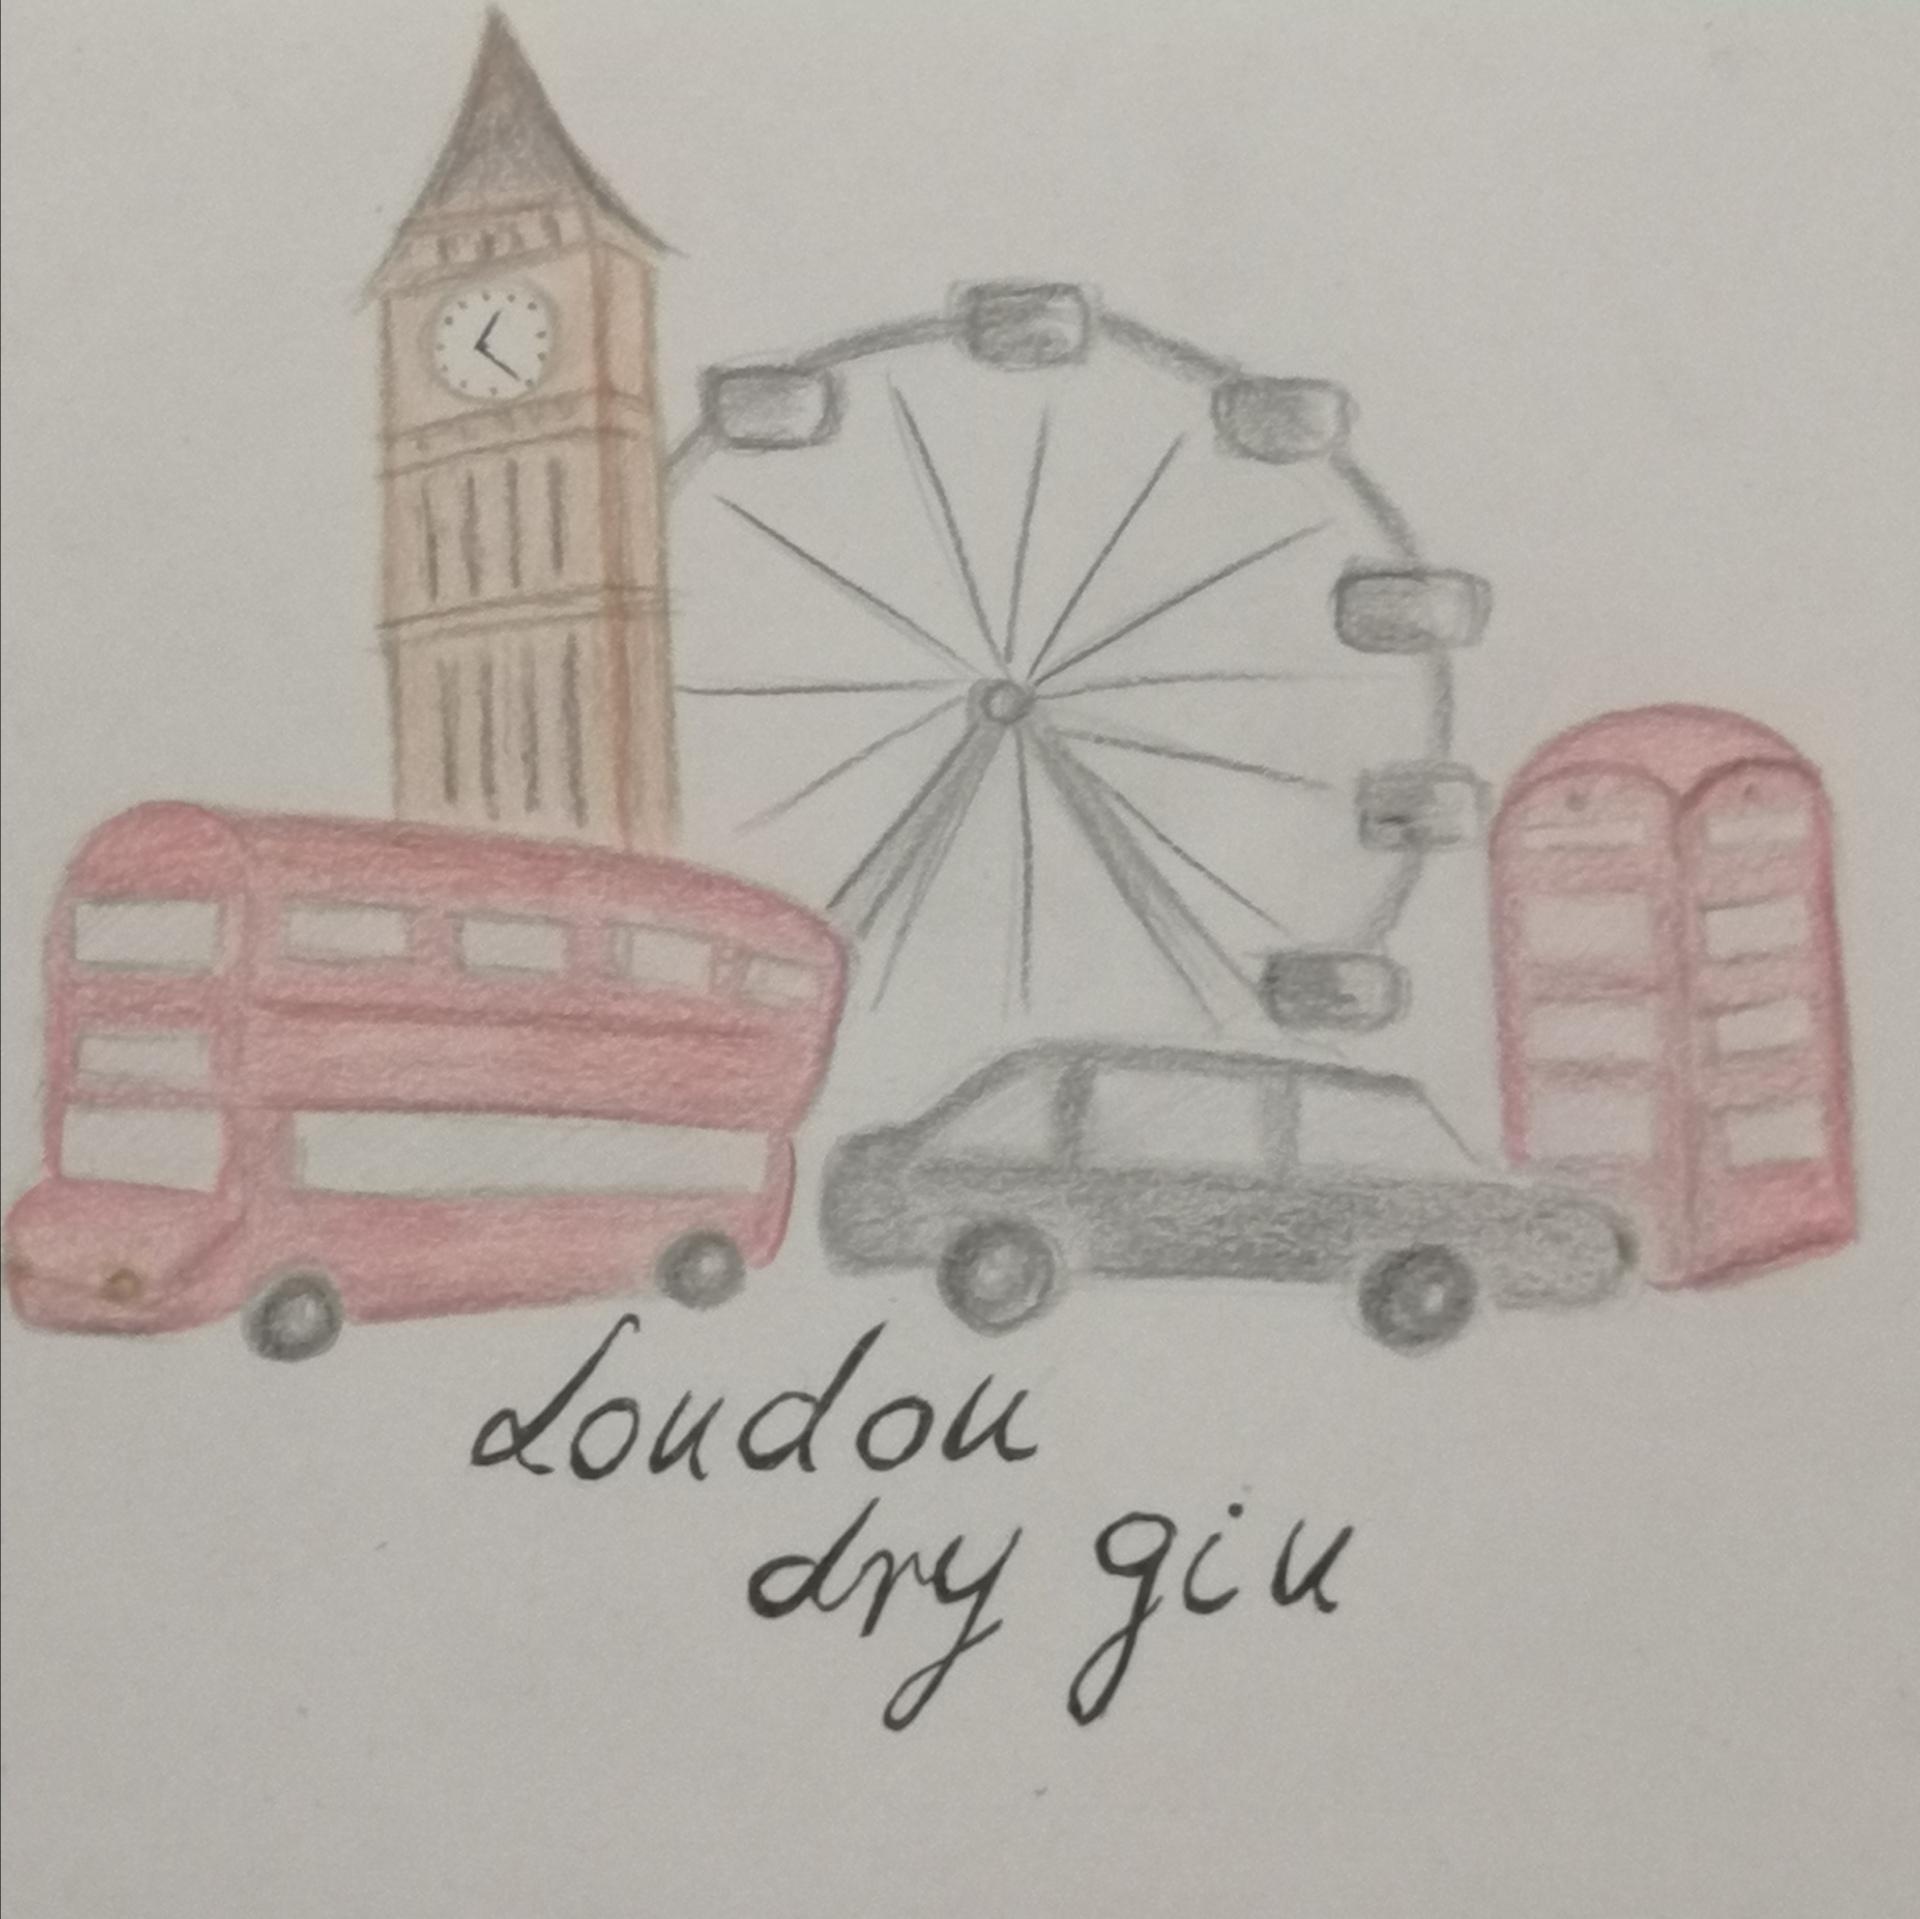 London jelképei: London Dry Gin